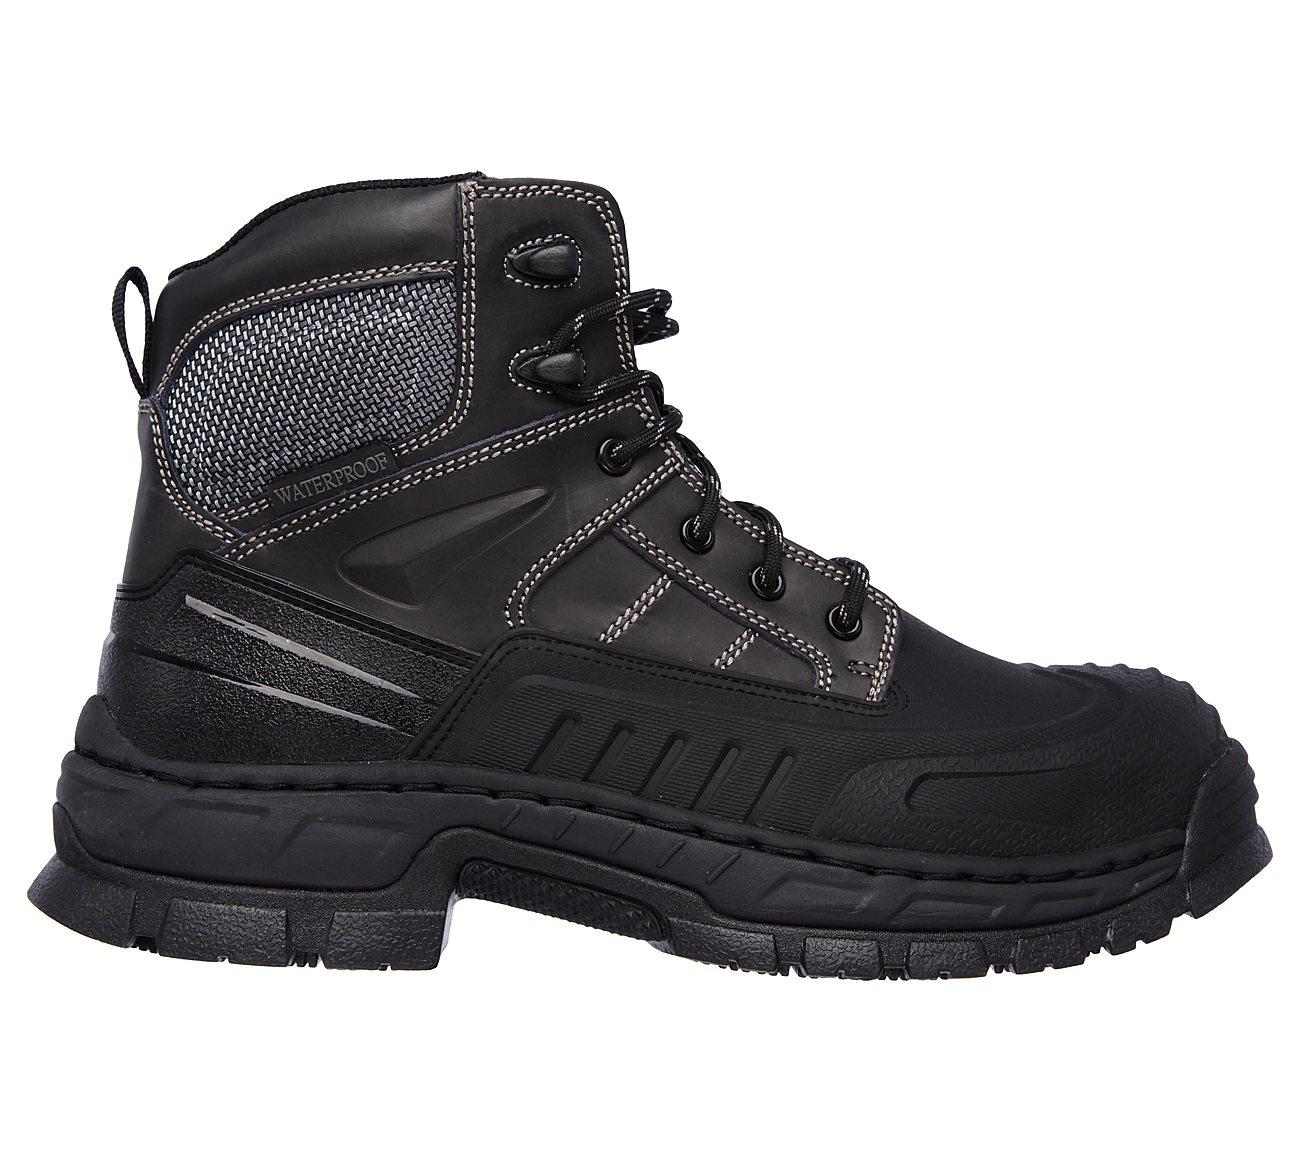 Mens Skechers Vinten Memory Foam Waterproof Steel Toe Lace Up Boot BlackBrown Leather